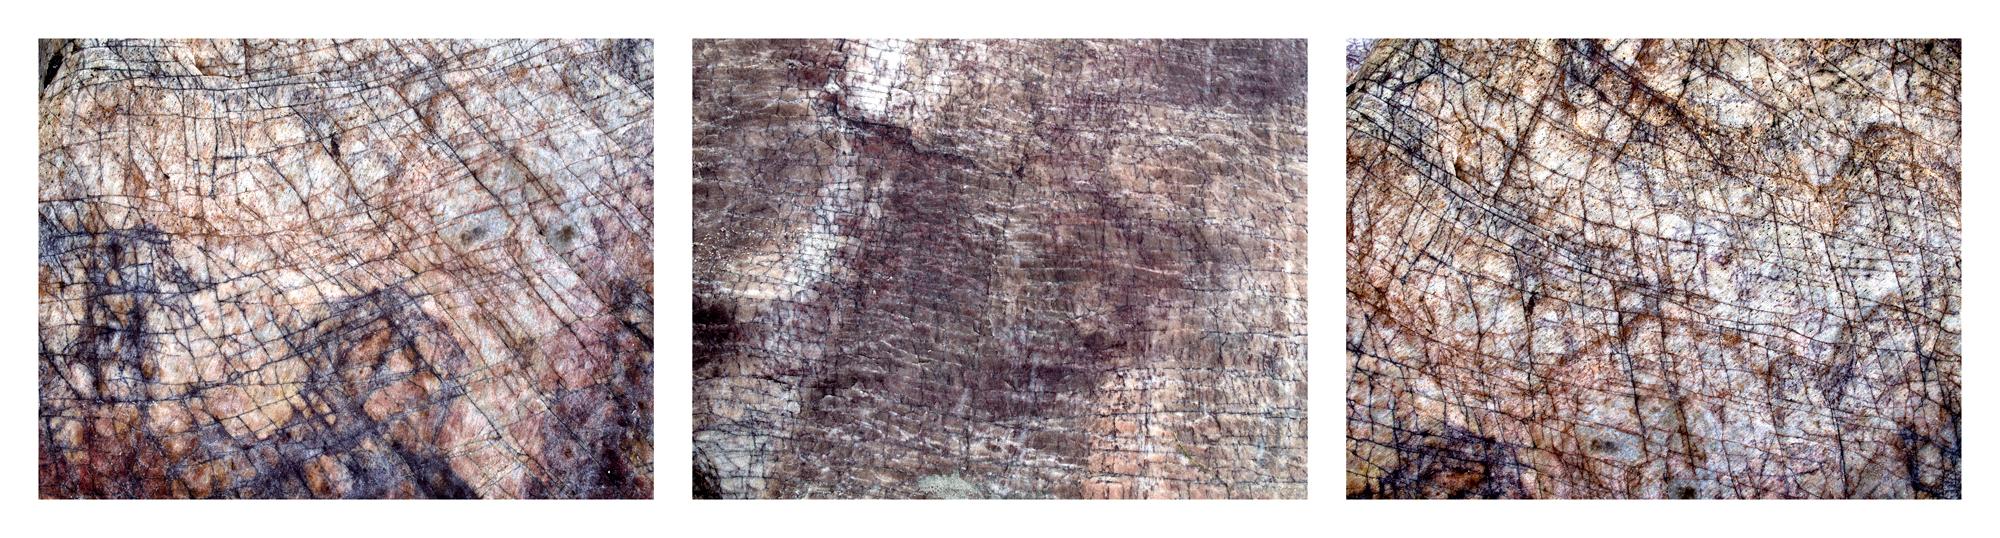 "Sea Writings III, Ceara Brazil  3 images, 15"" x 20"", 2015"